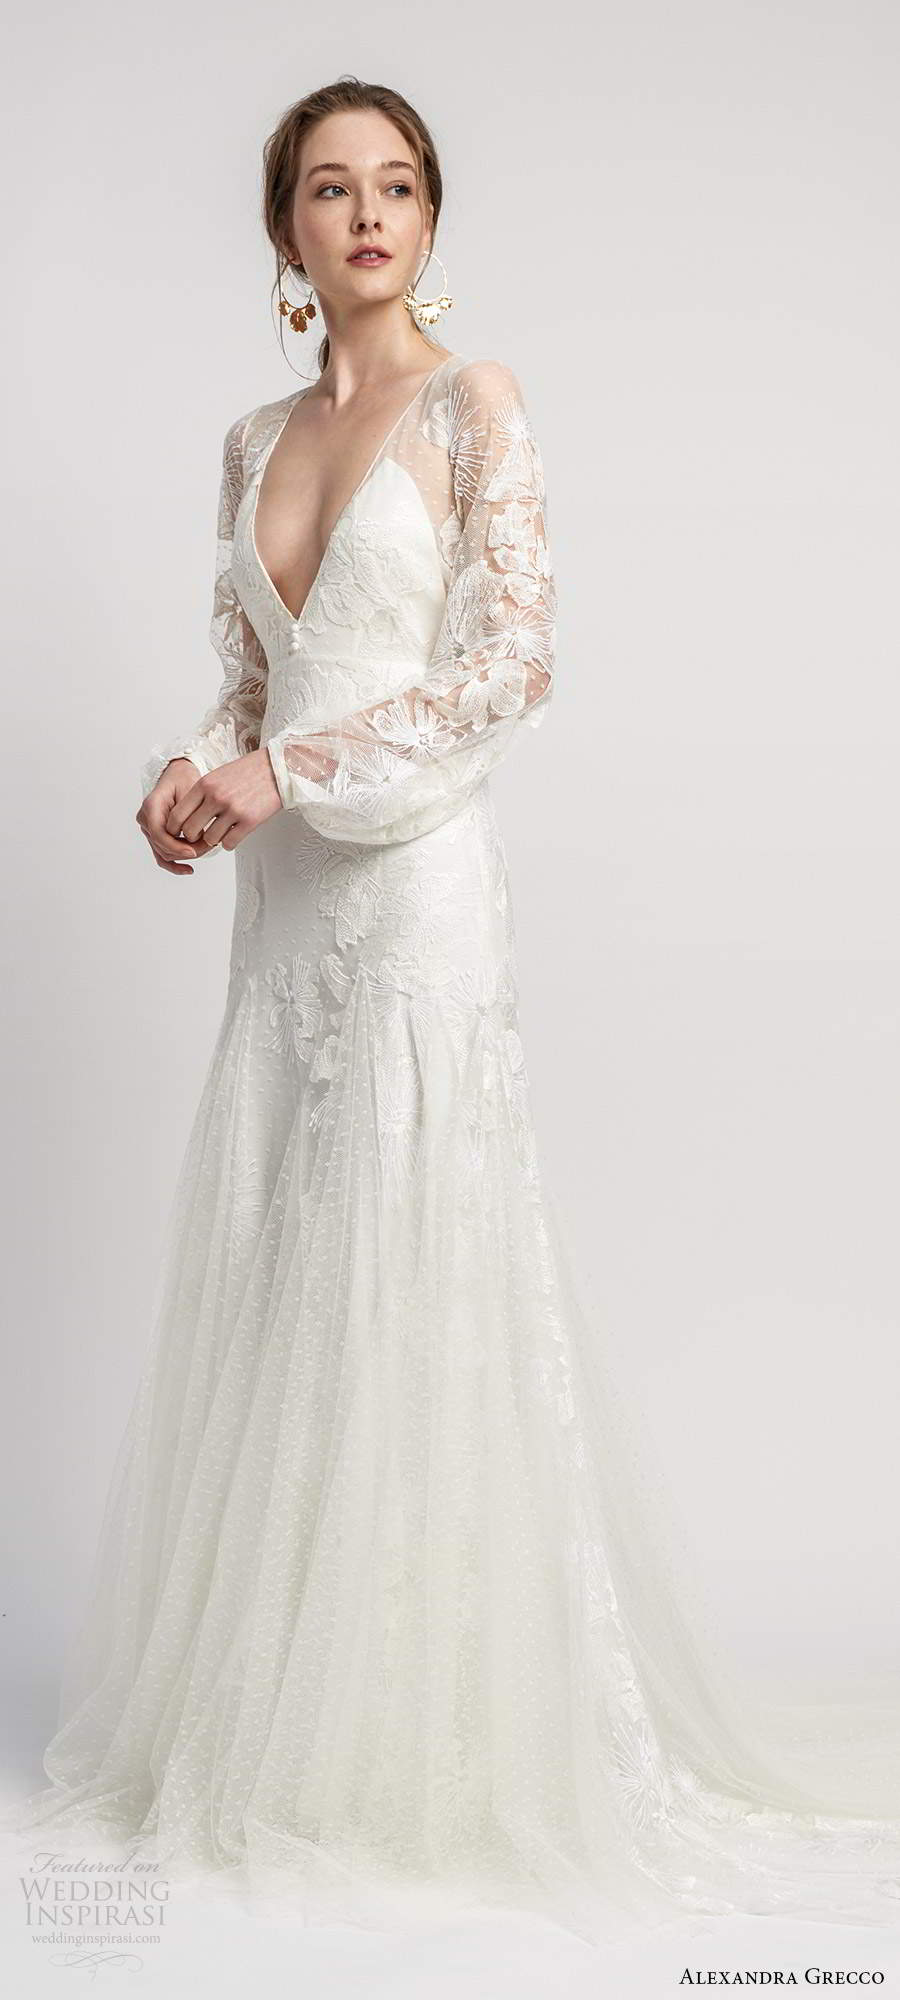 alexandra grecco 2020 bridal illusion long bishop sleeves plunging v neckline fully embellished lace fit flare mermaid boho wedding dress sheer back chapel train (2) mv